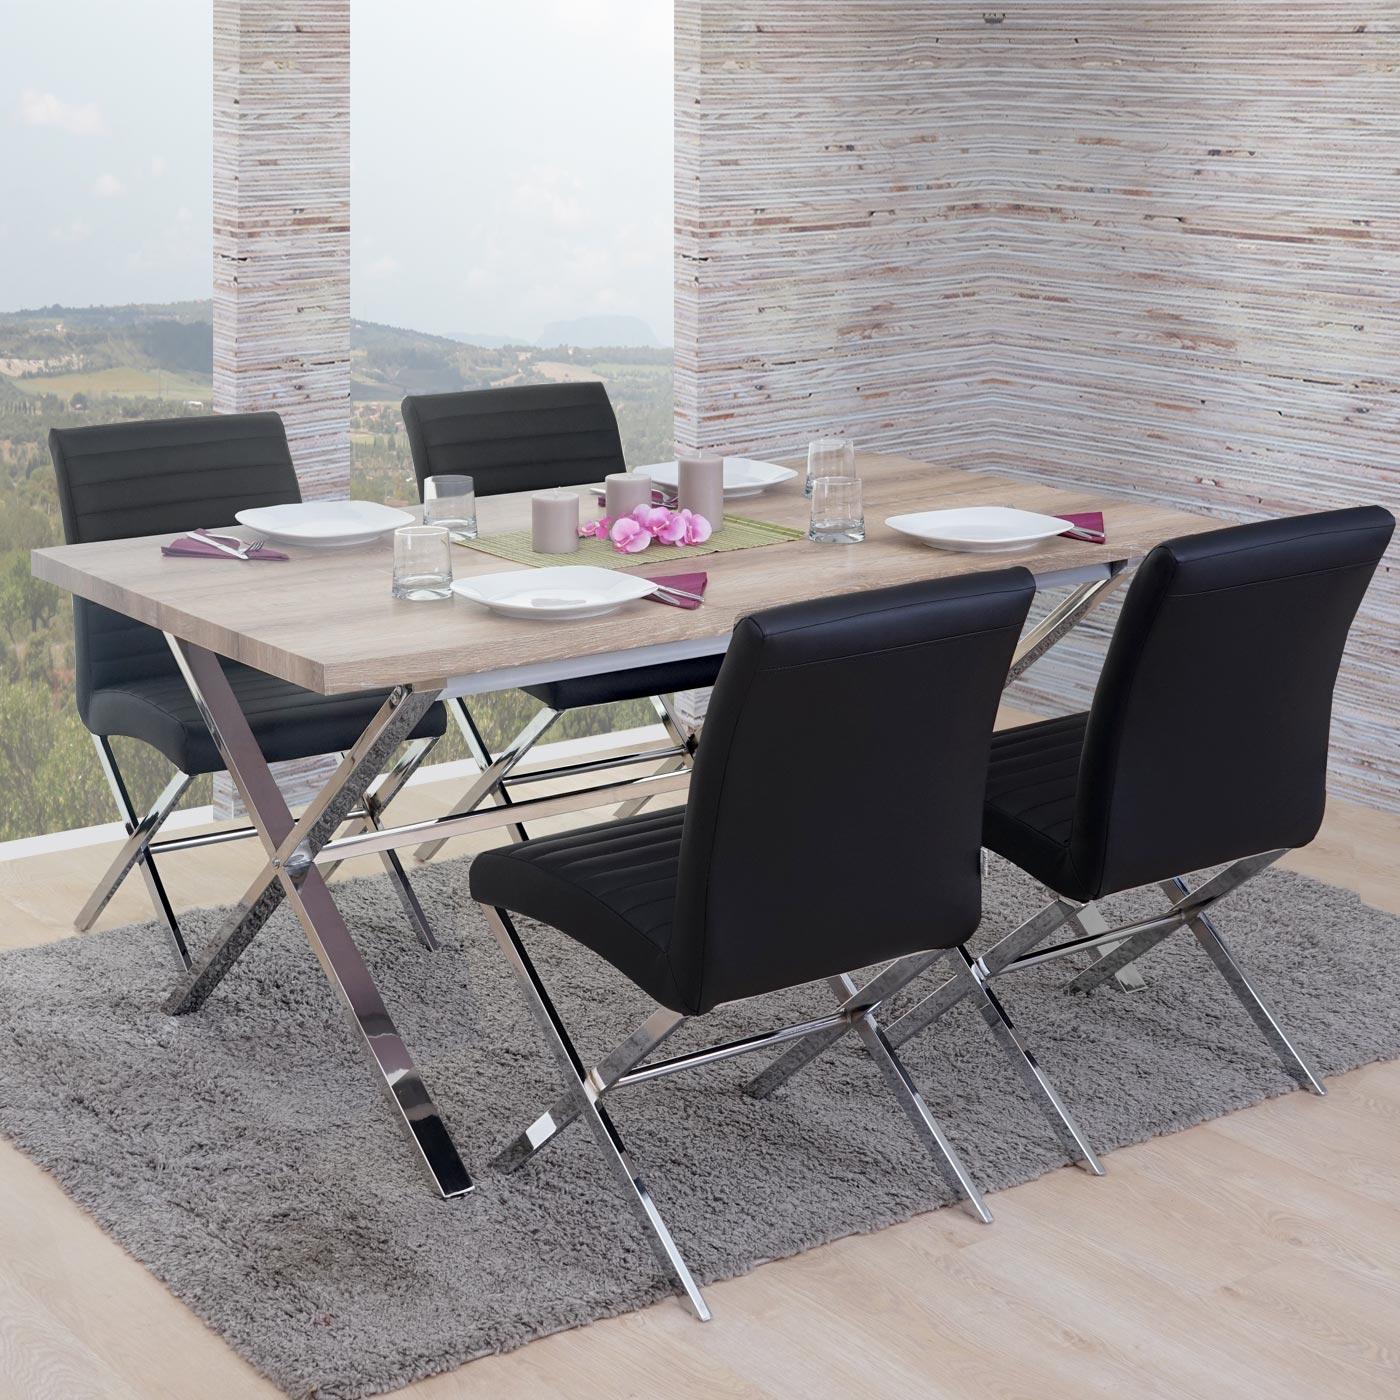 esszimmergarnitur fano tisch 4 st hle 3d struktur. Black Bedroom Furniture Sets. Home Design Ideas